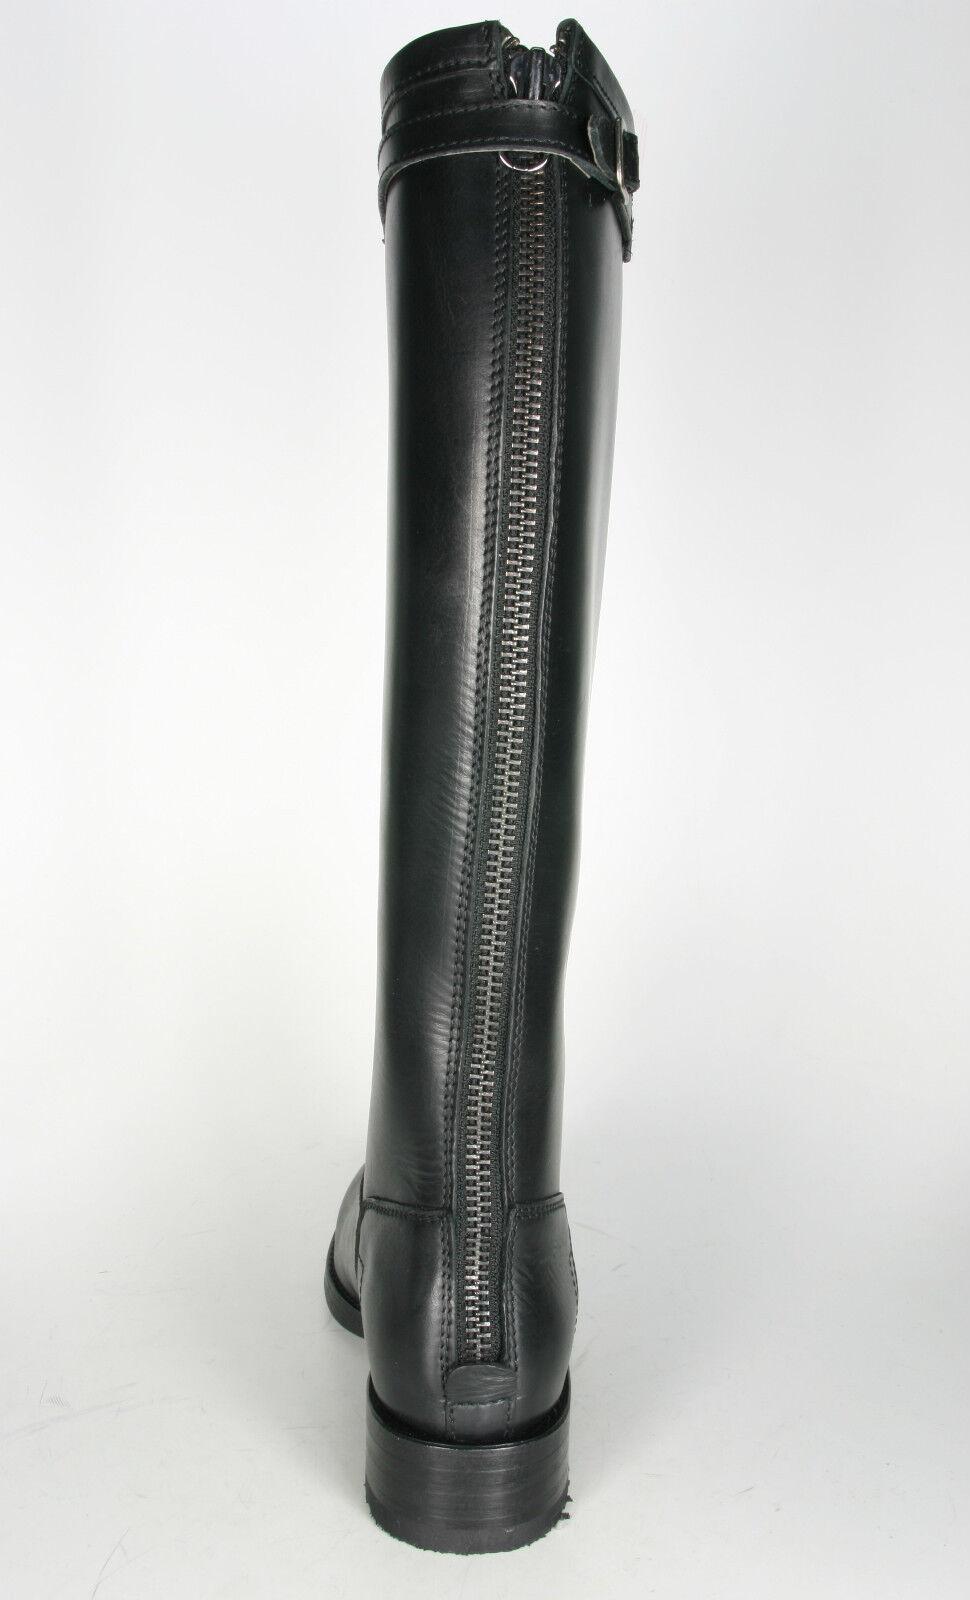 11723 Sendra Sendra Sendra Stiefel schwarz Schwarz Hochschaft 40de75